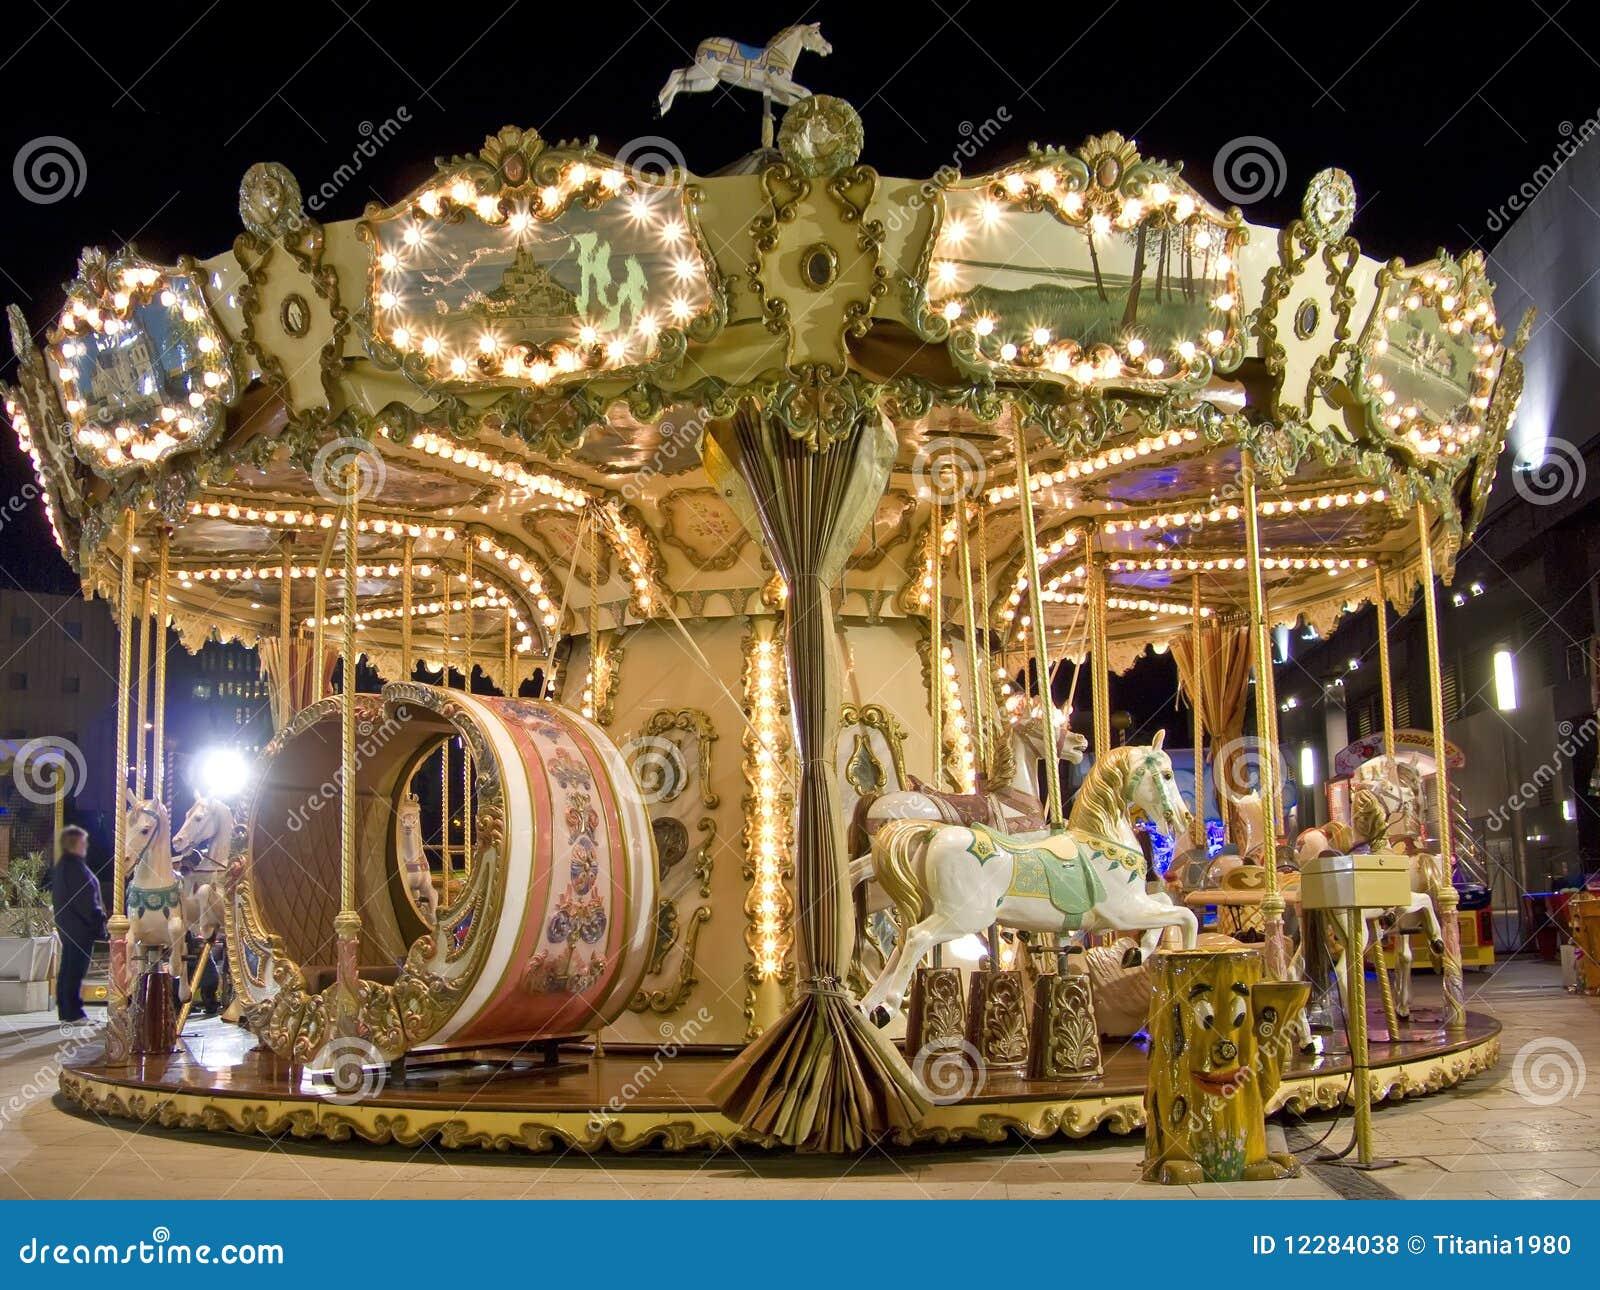 Carousel At Night Royalty Free Stock Photos - Image: 12284038